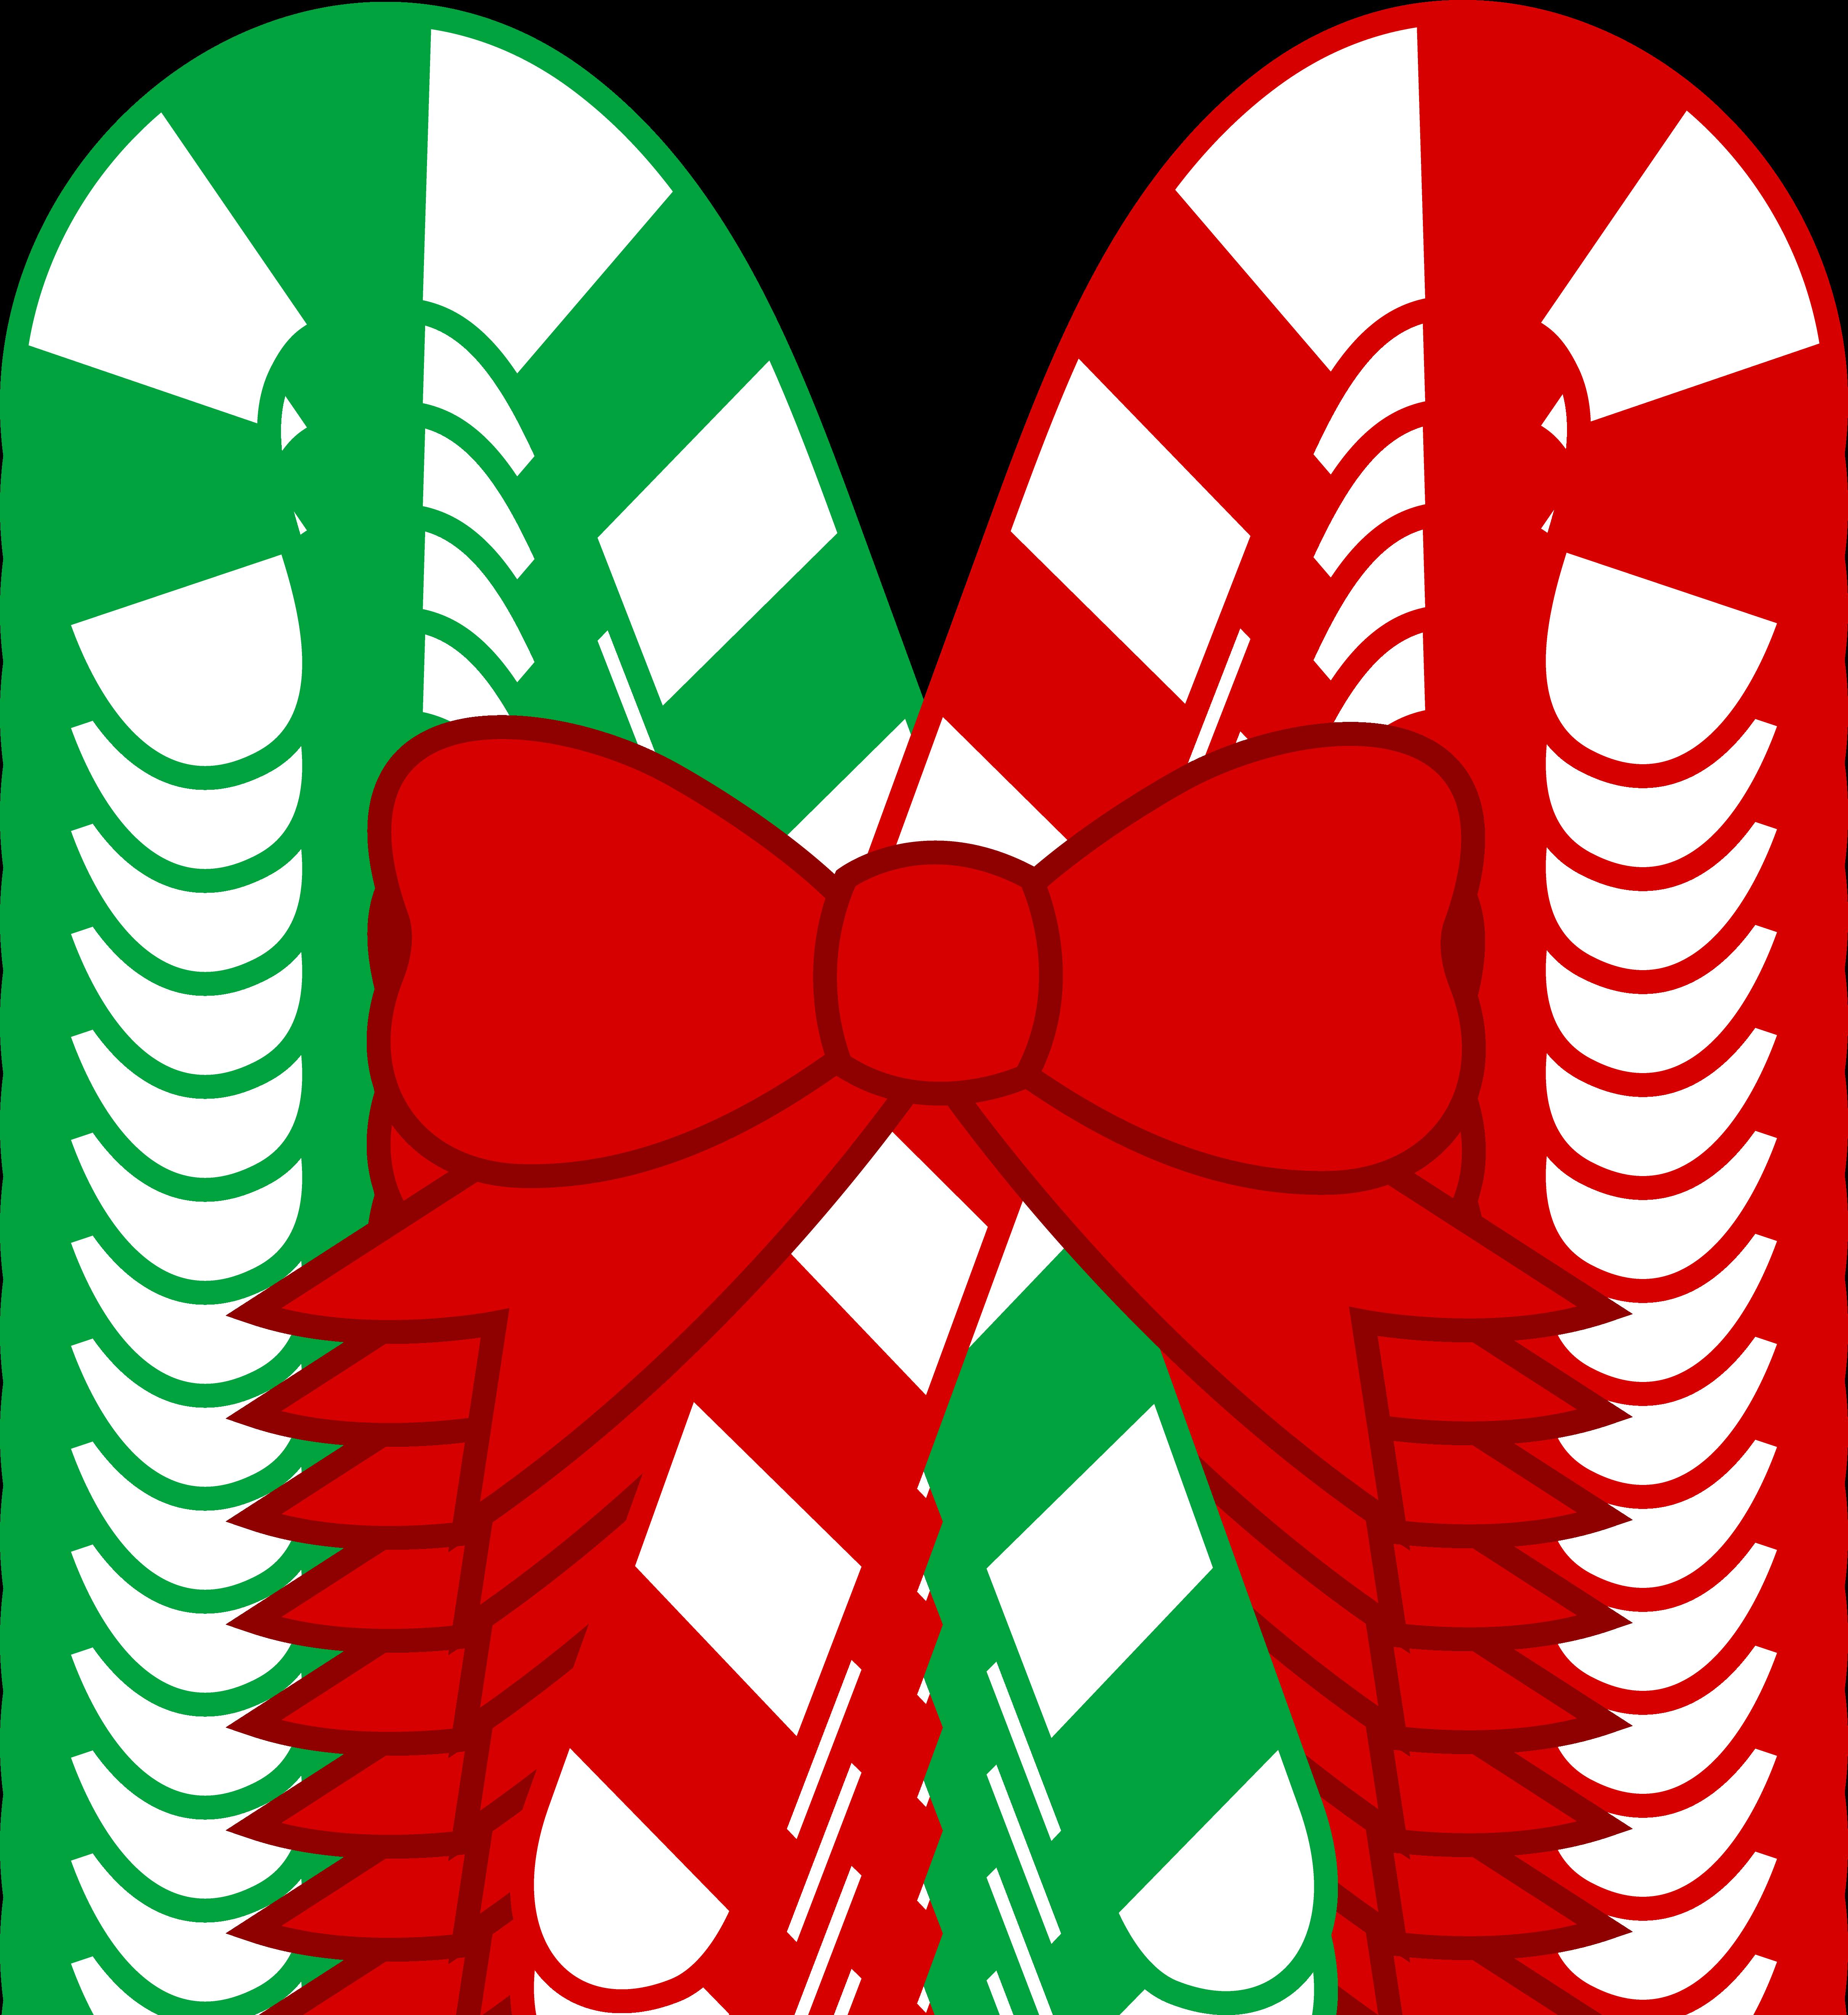 Clipart Christmas Party-clipart christmas party-12